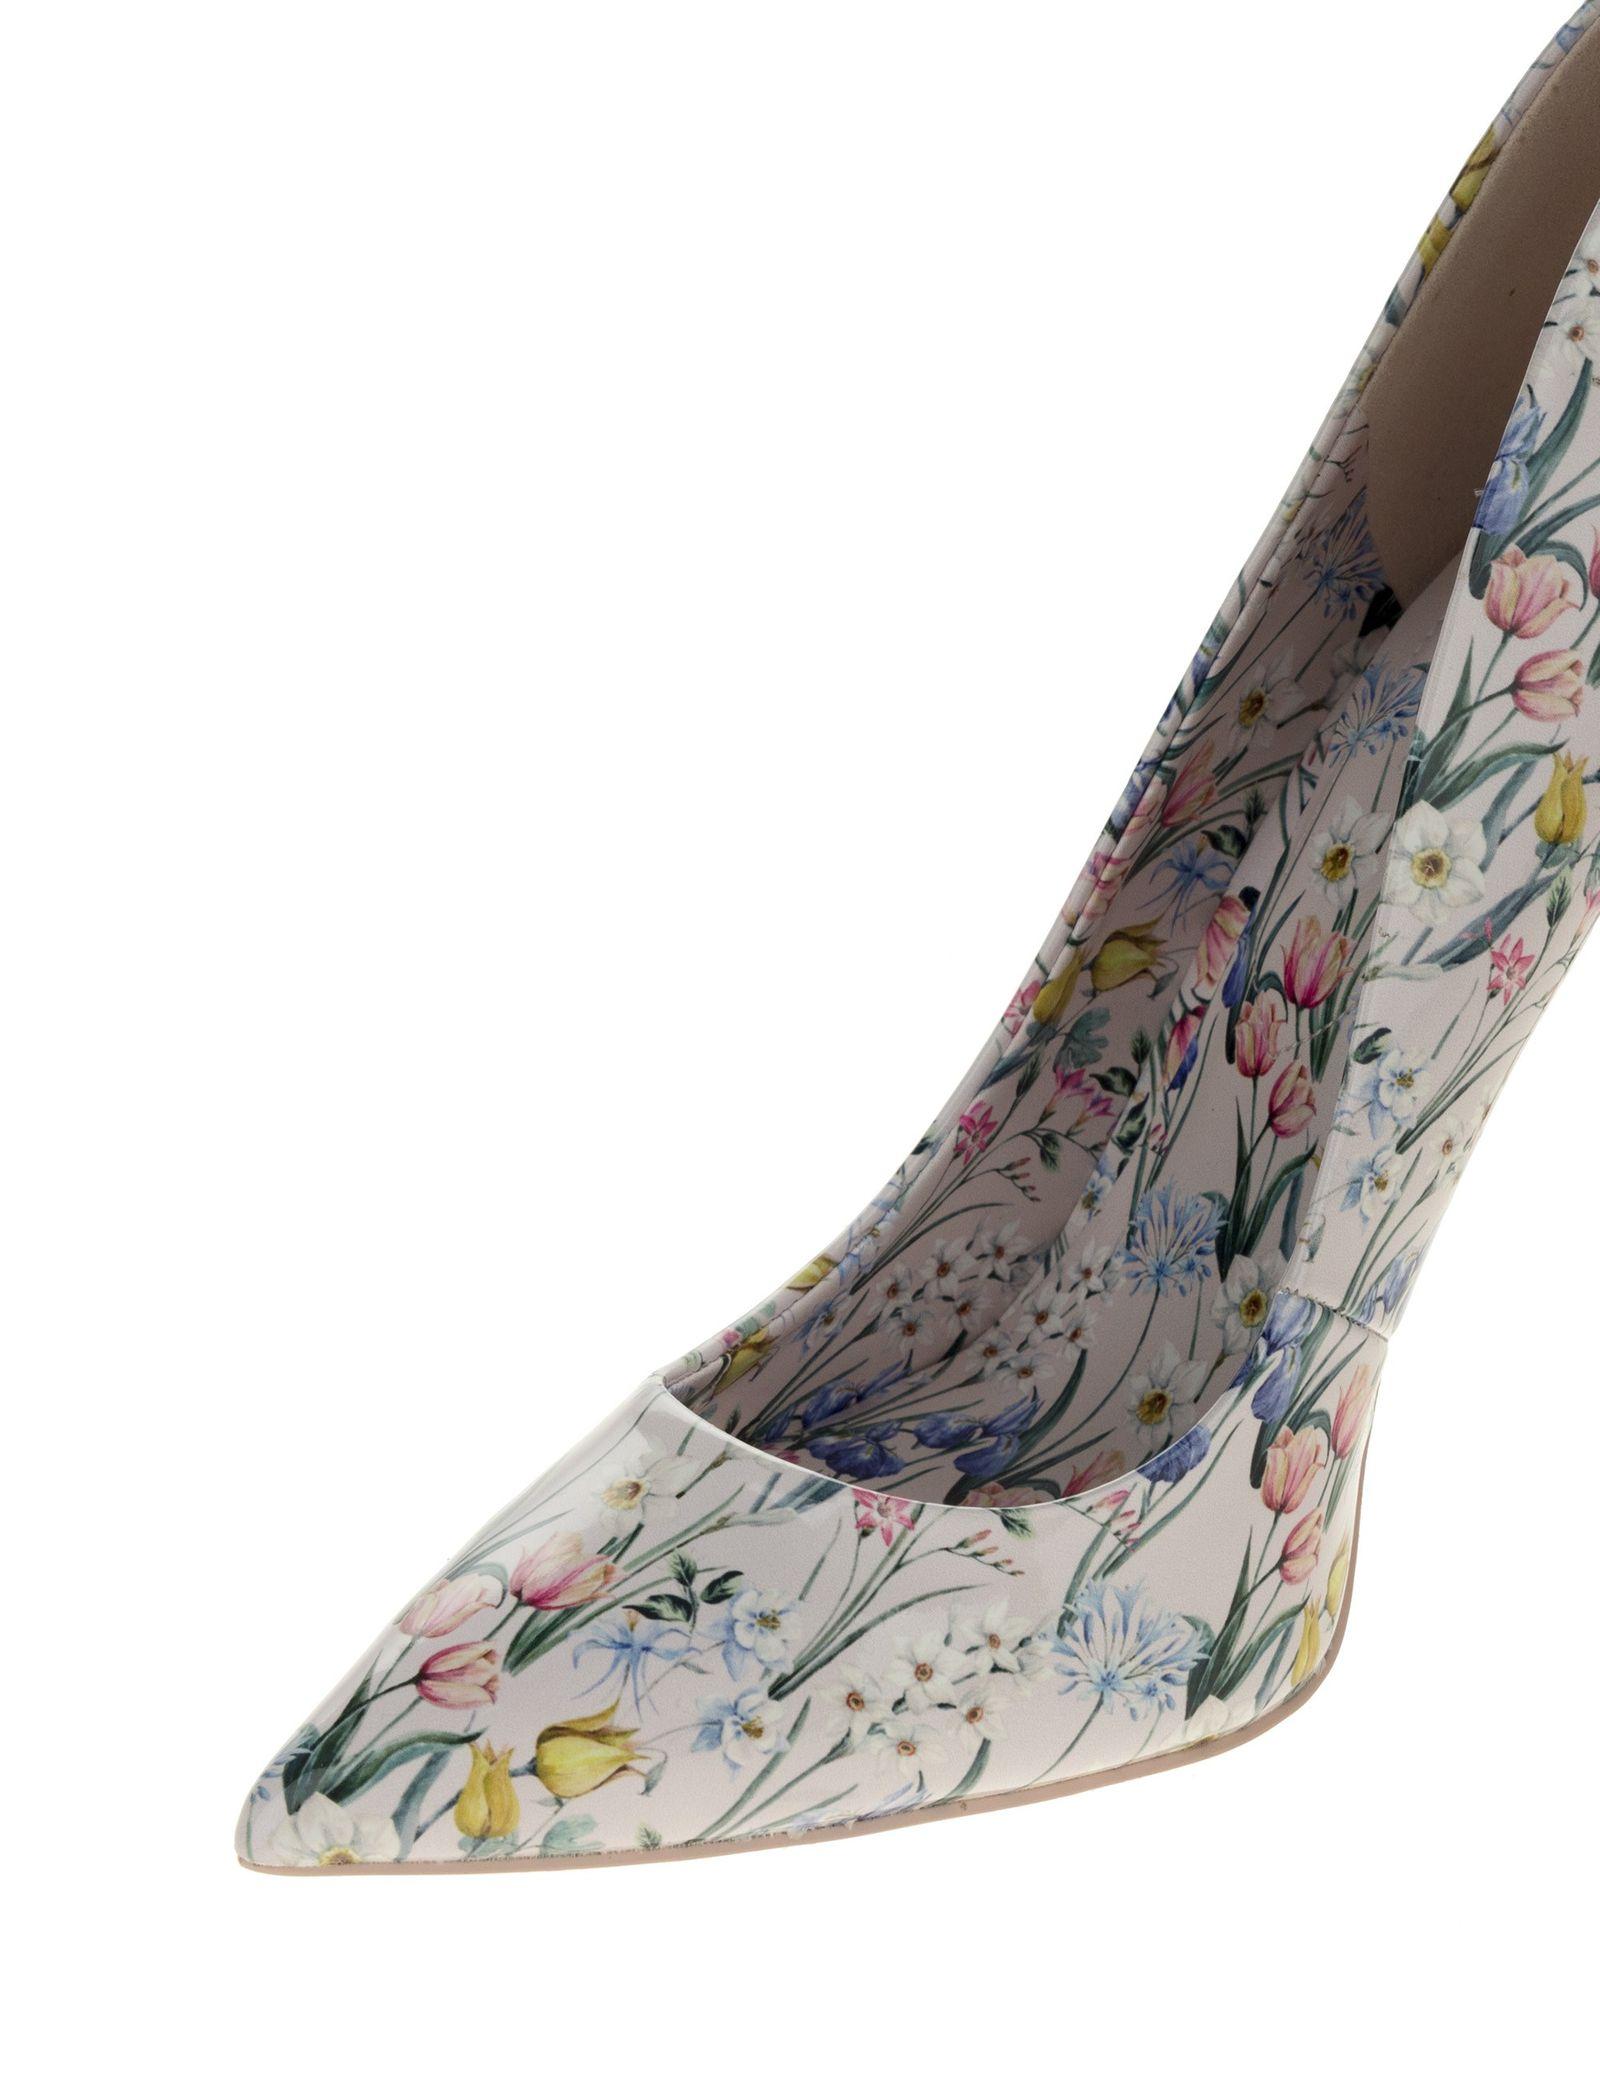 کفش پاشنه بلند زنانه - آلدو - صورتي  - 6